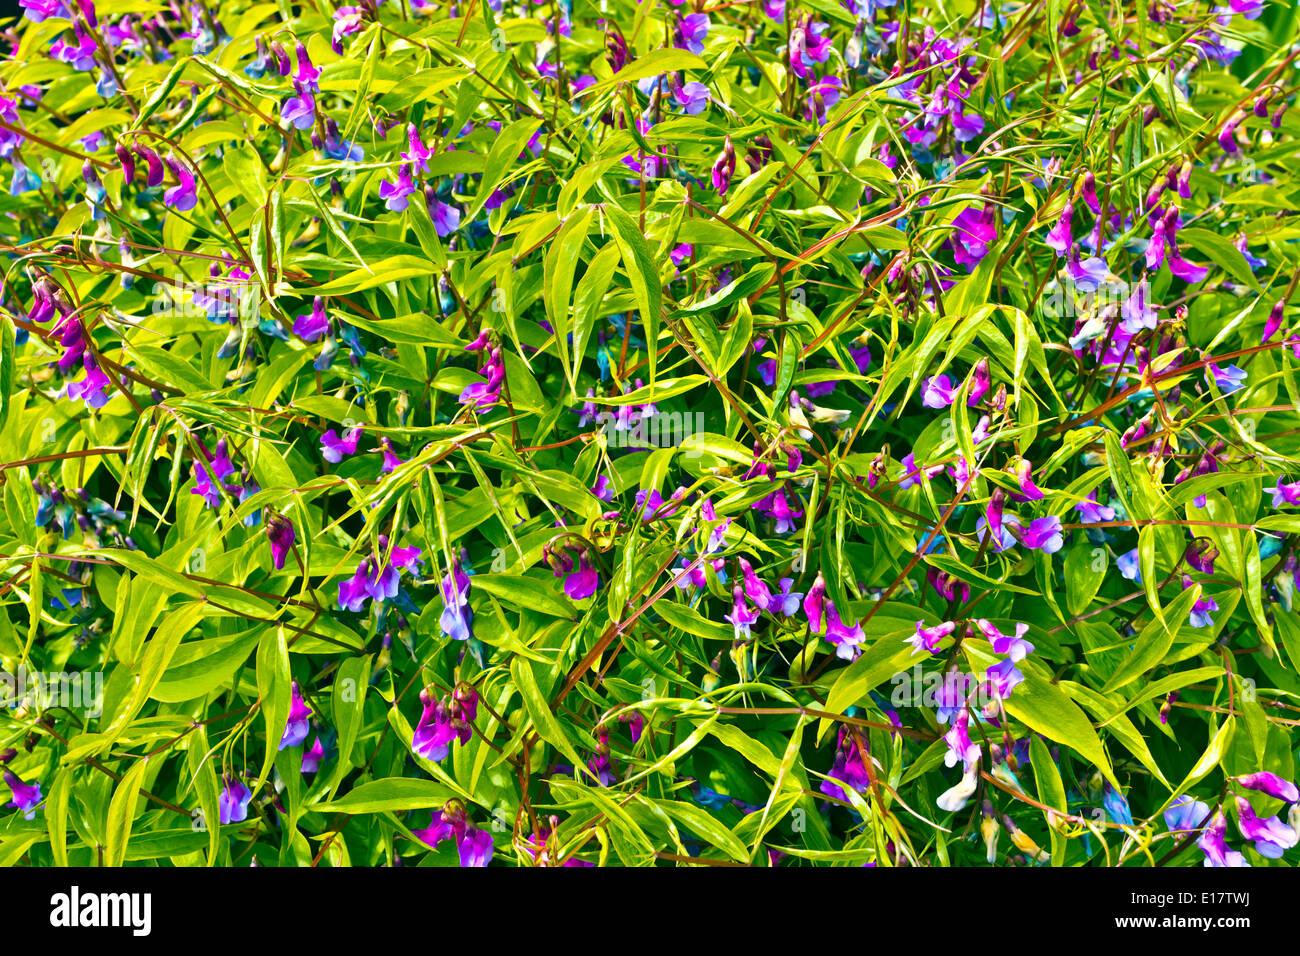 Spring pea Lathyrus vernus perennial flowering plant. - Stock Image